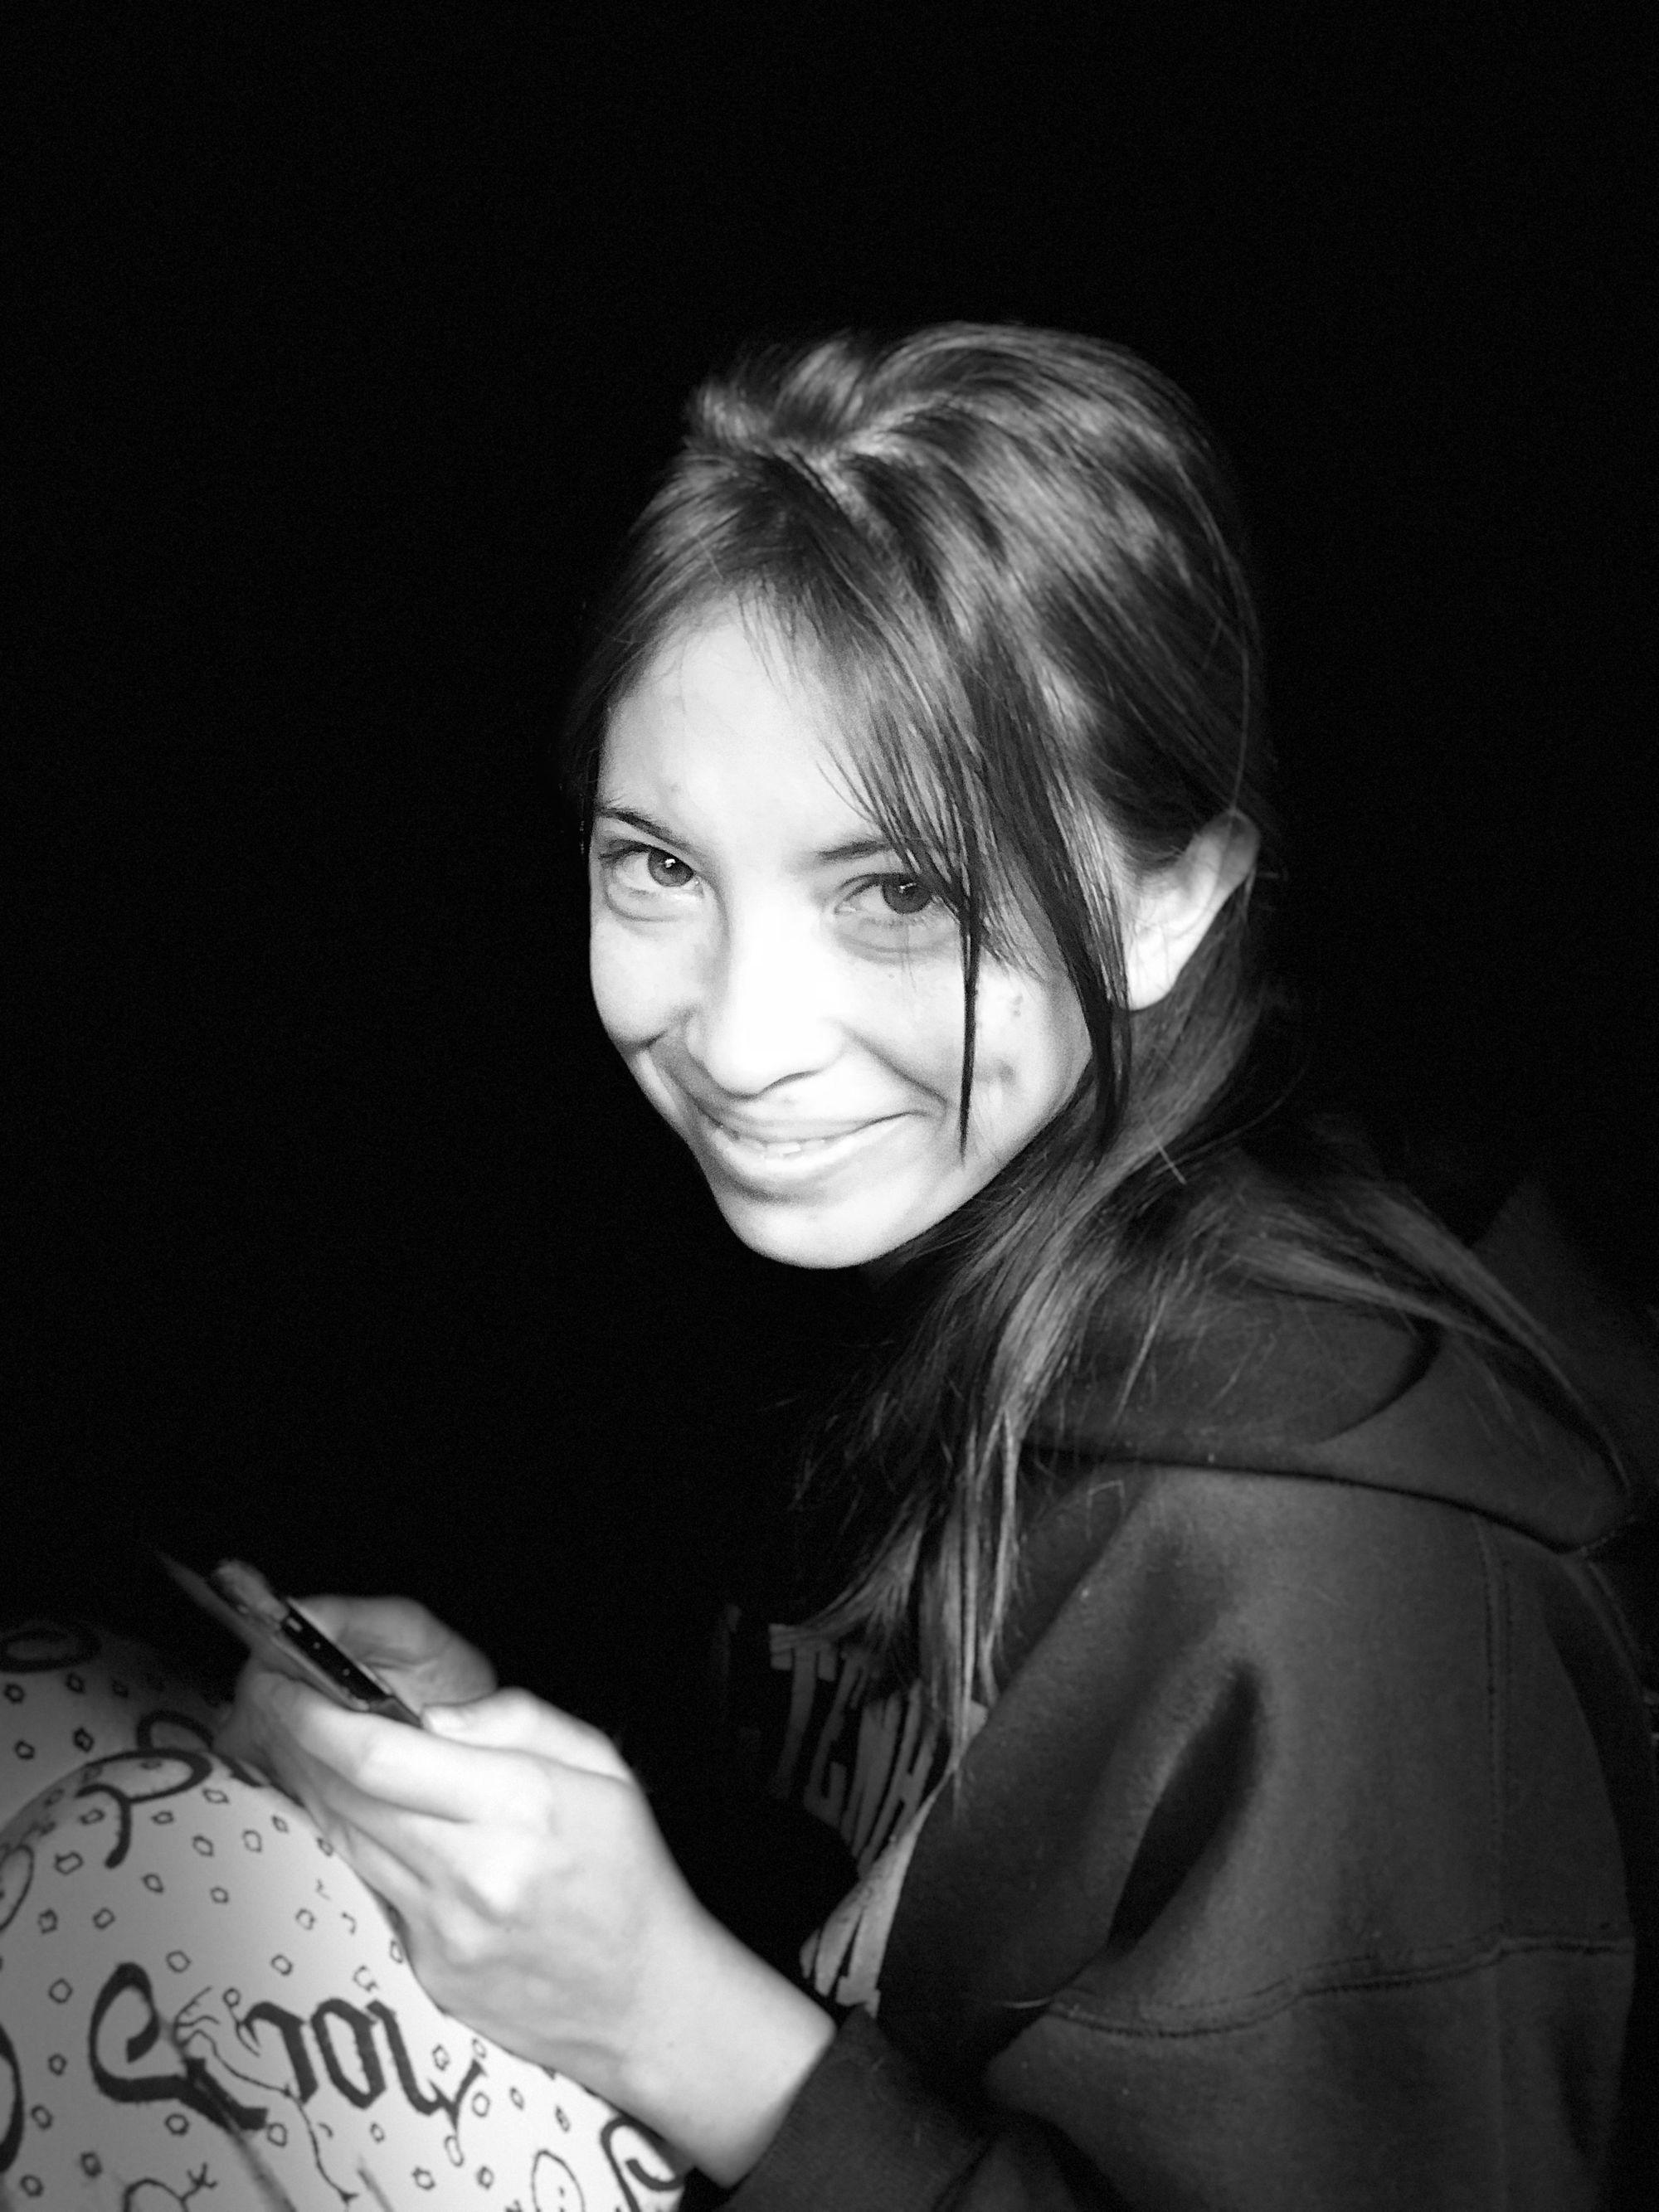 Amanda Vacharat